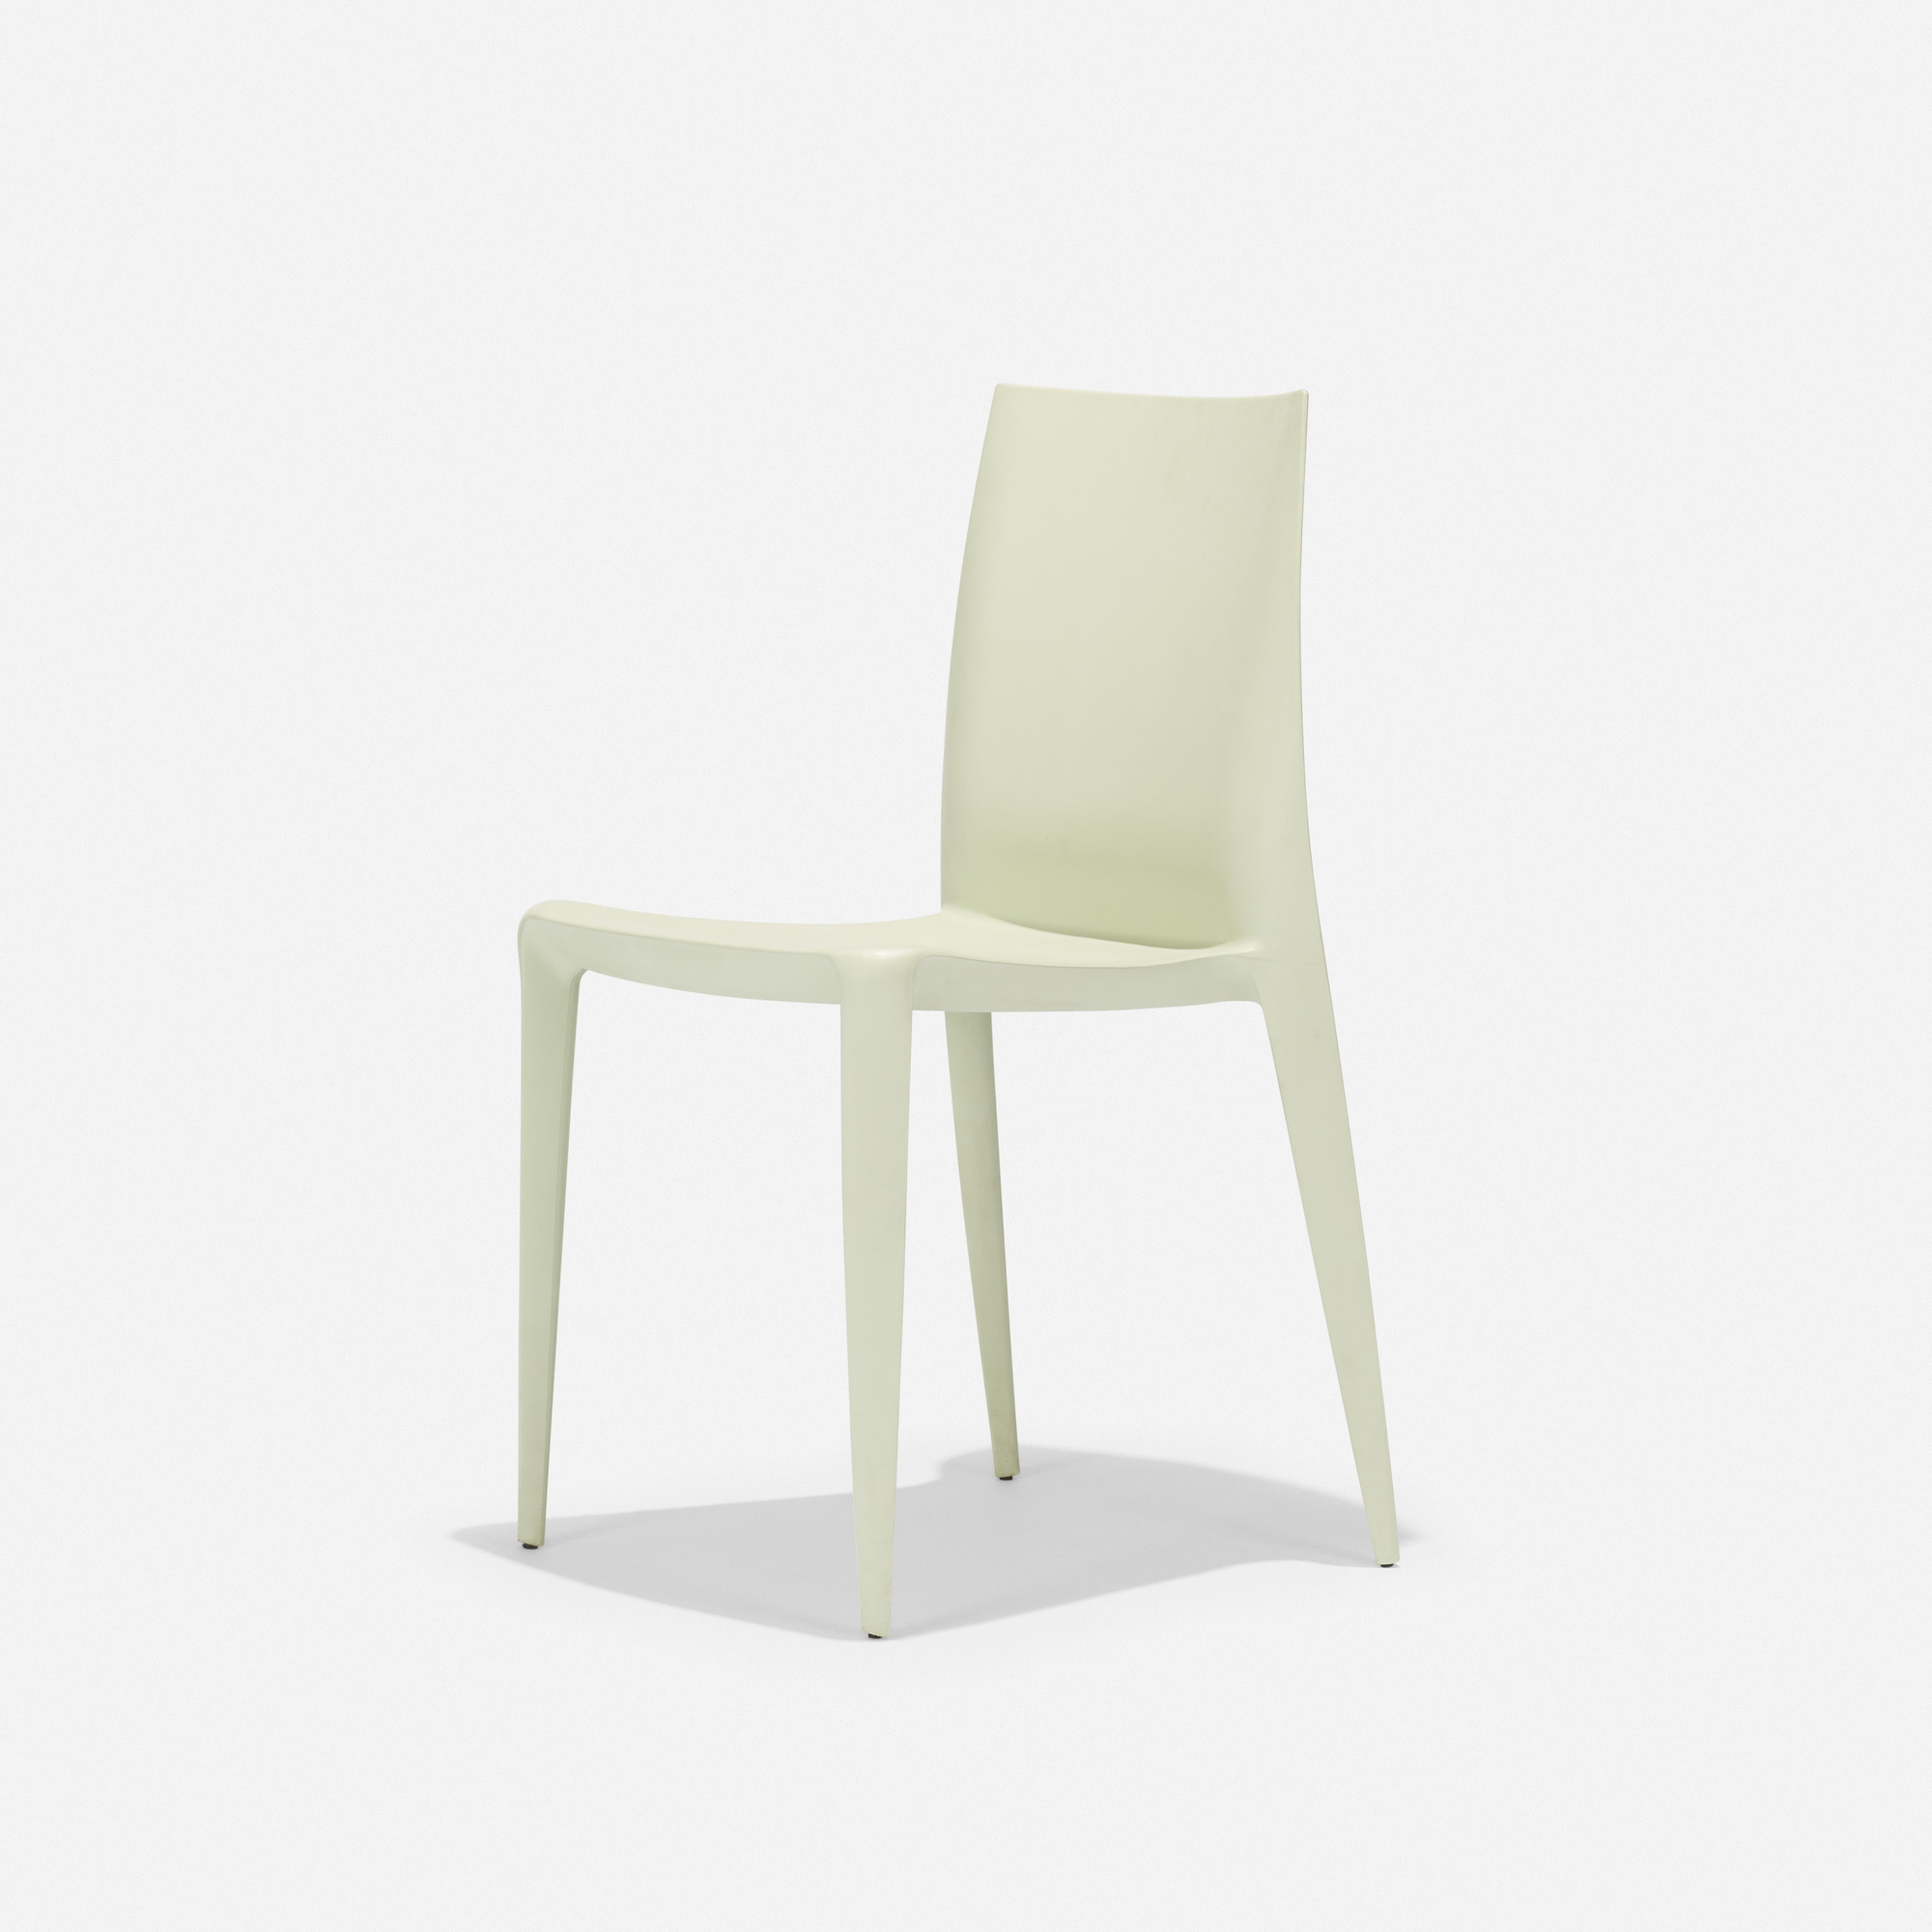 349: Mario Bellini / The Bellini chair (1 of 3)